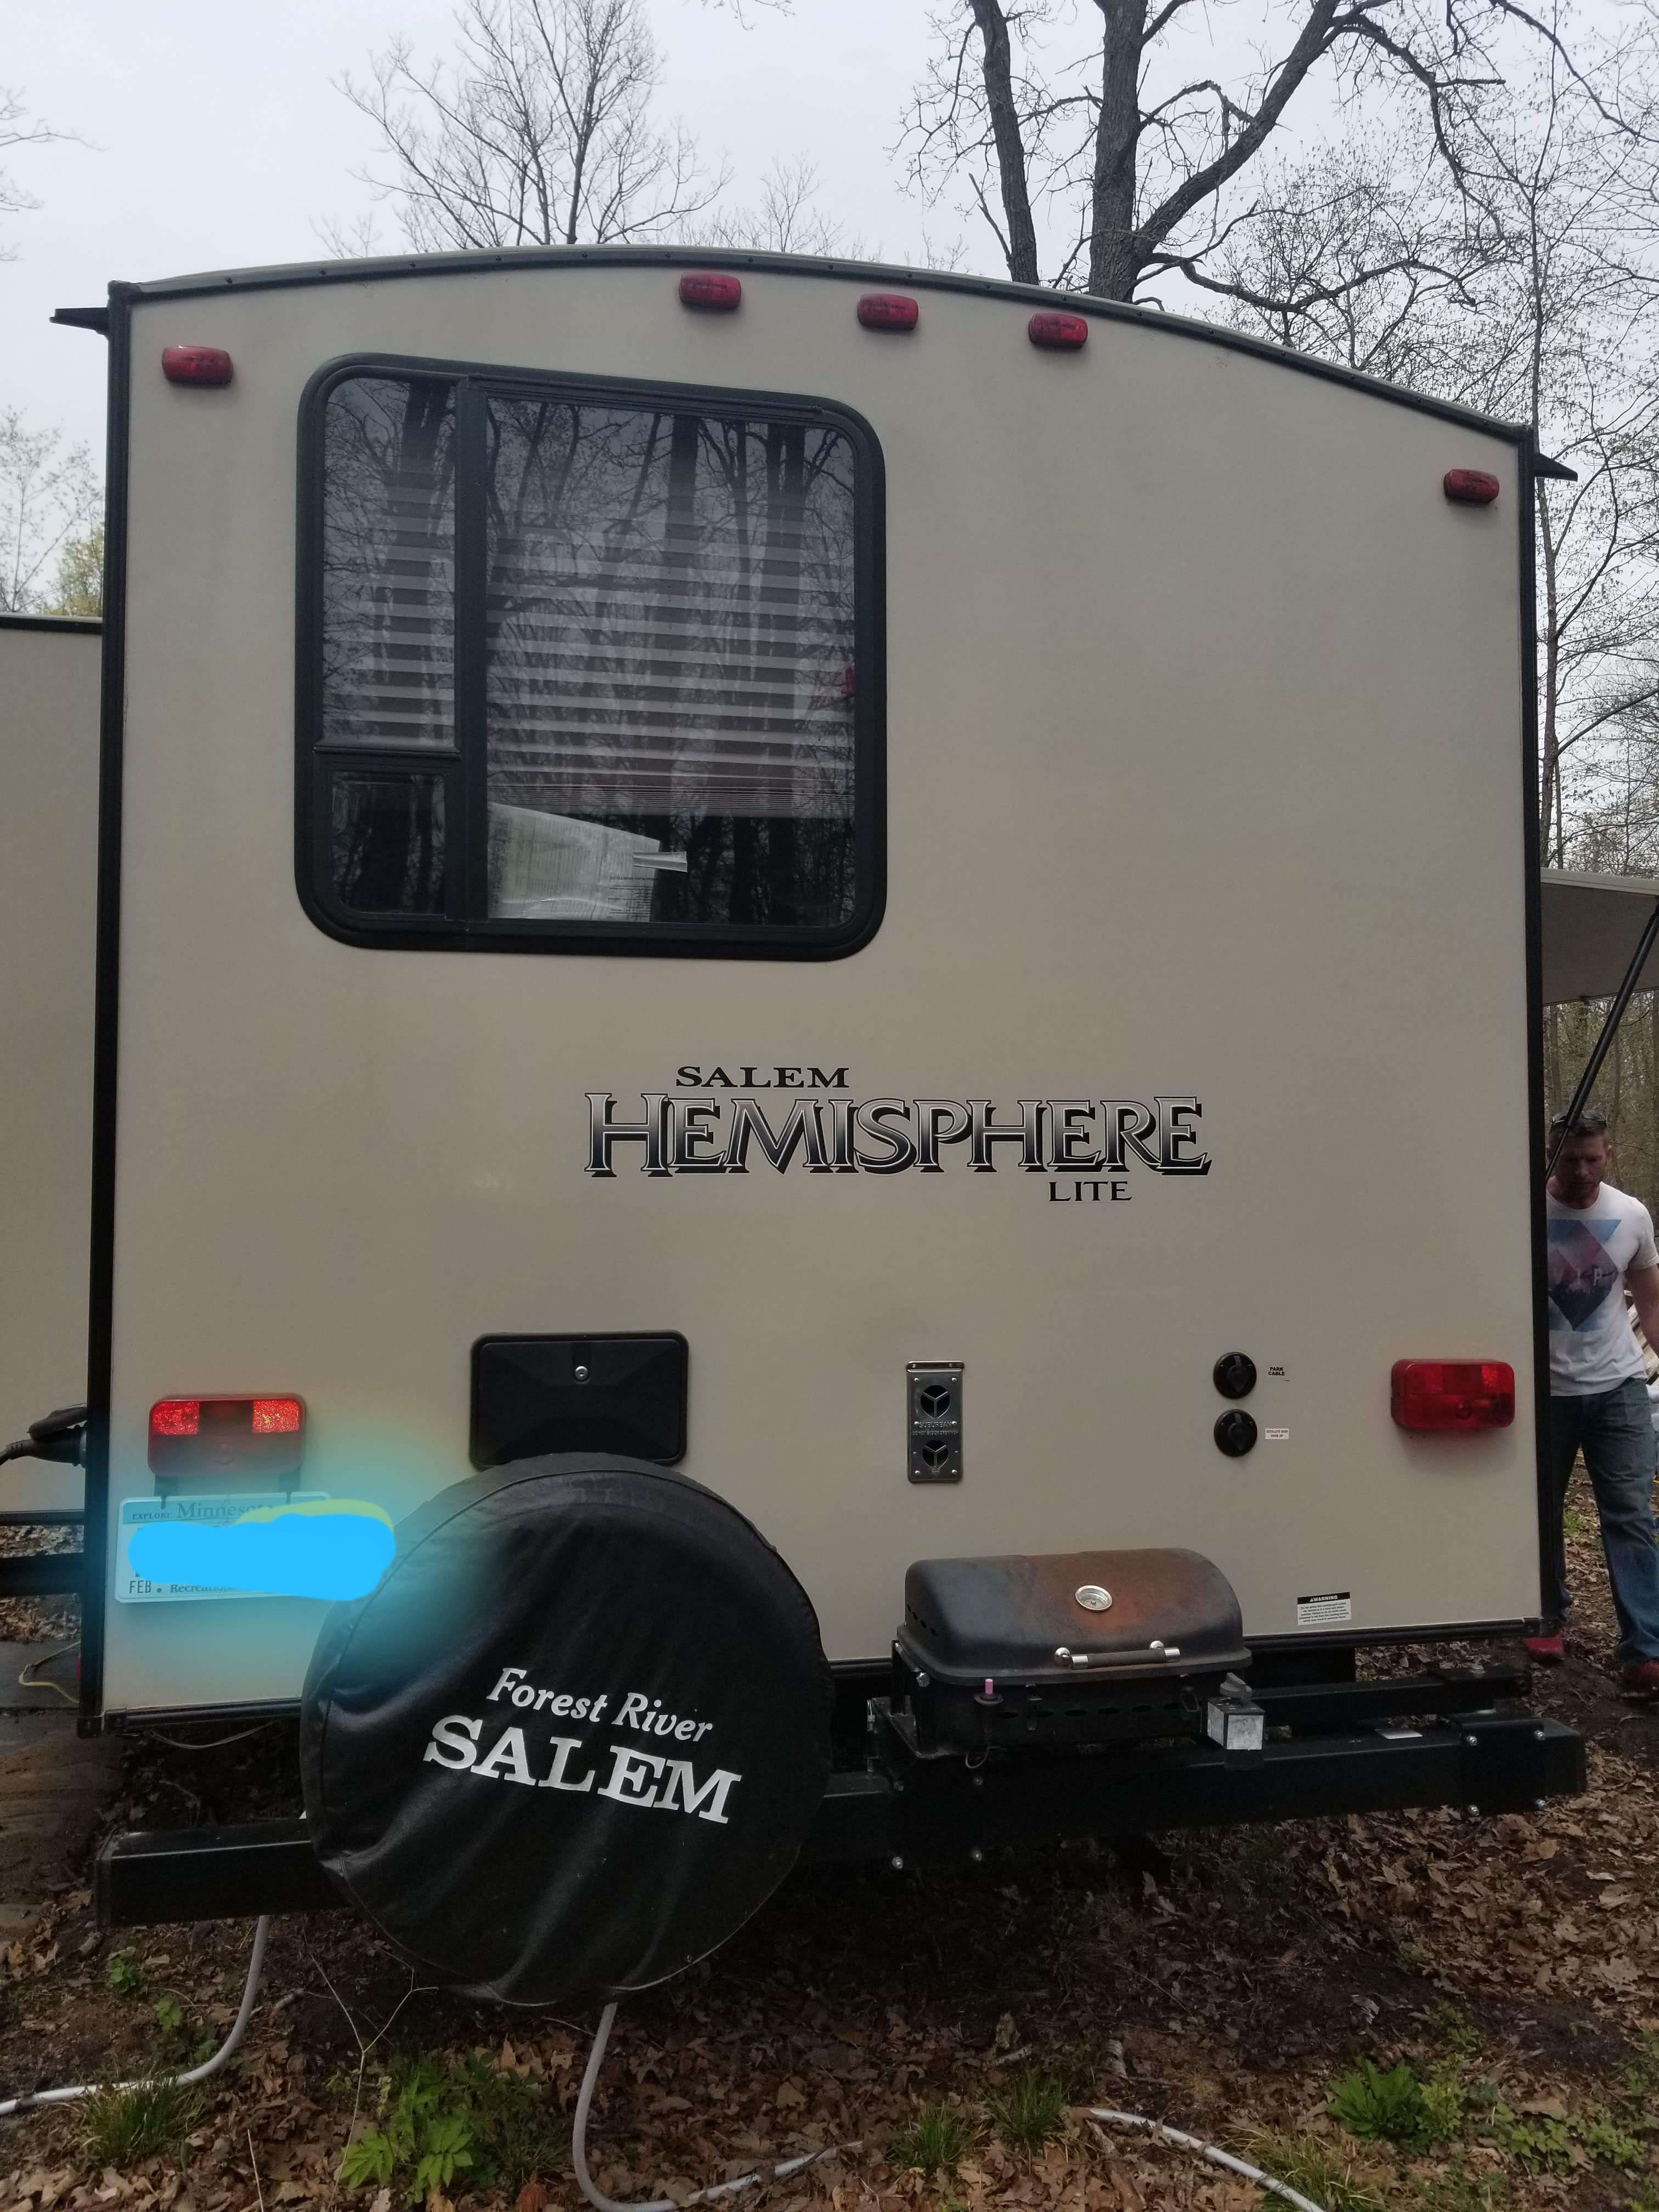 Forest River Salem Hemisphere 2016